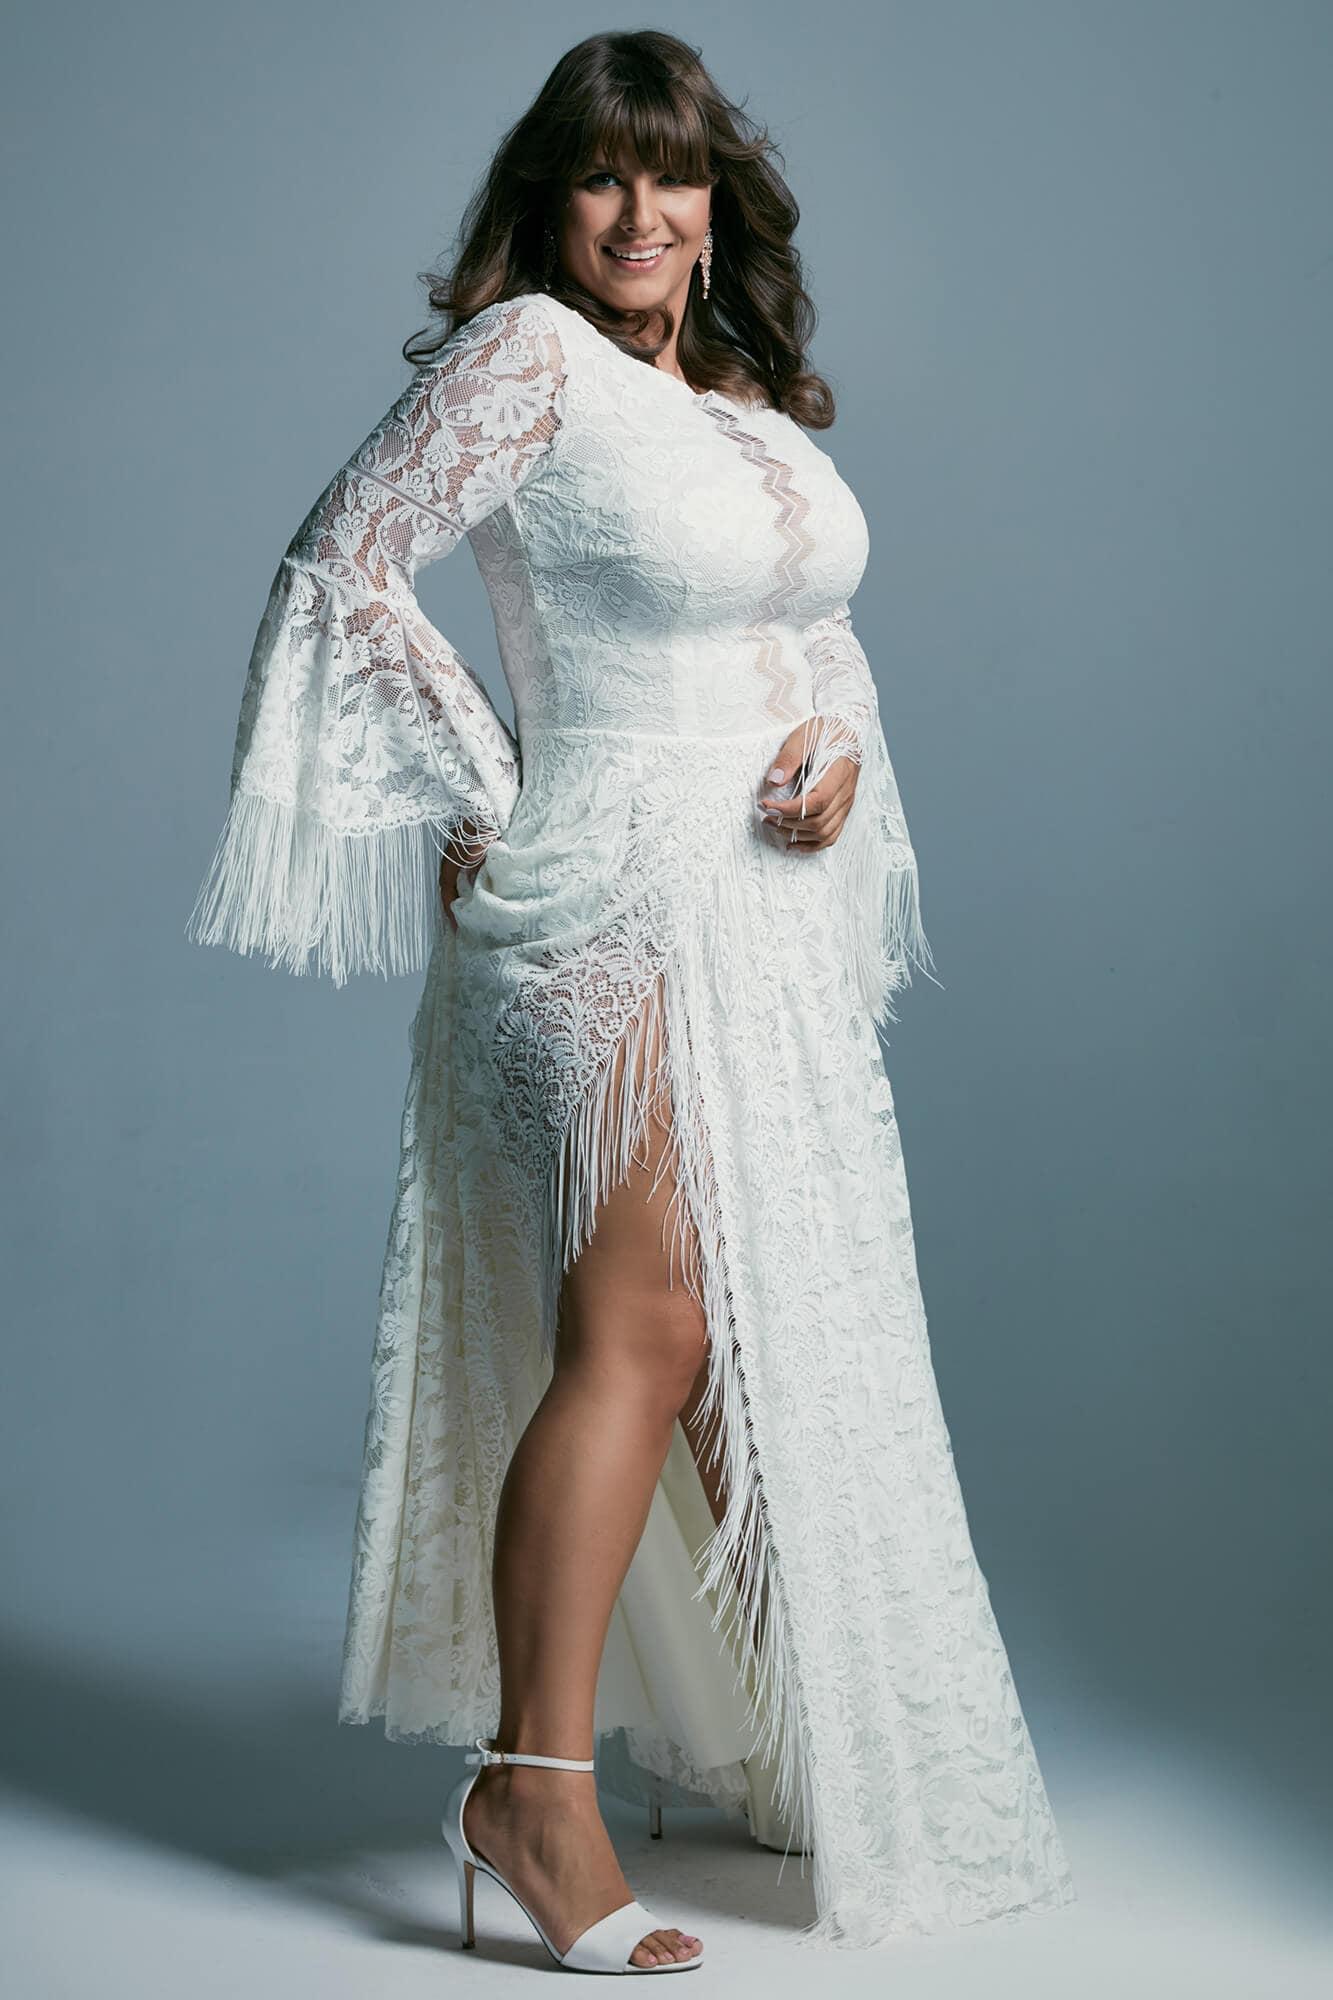 Plus size boho wedding dress with extended sleeves Porto 51 plus size